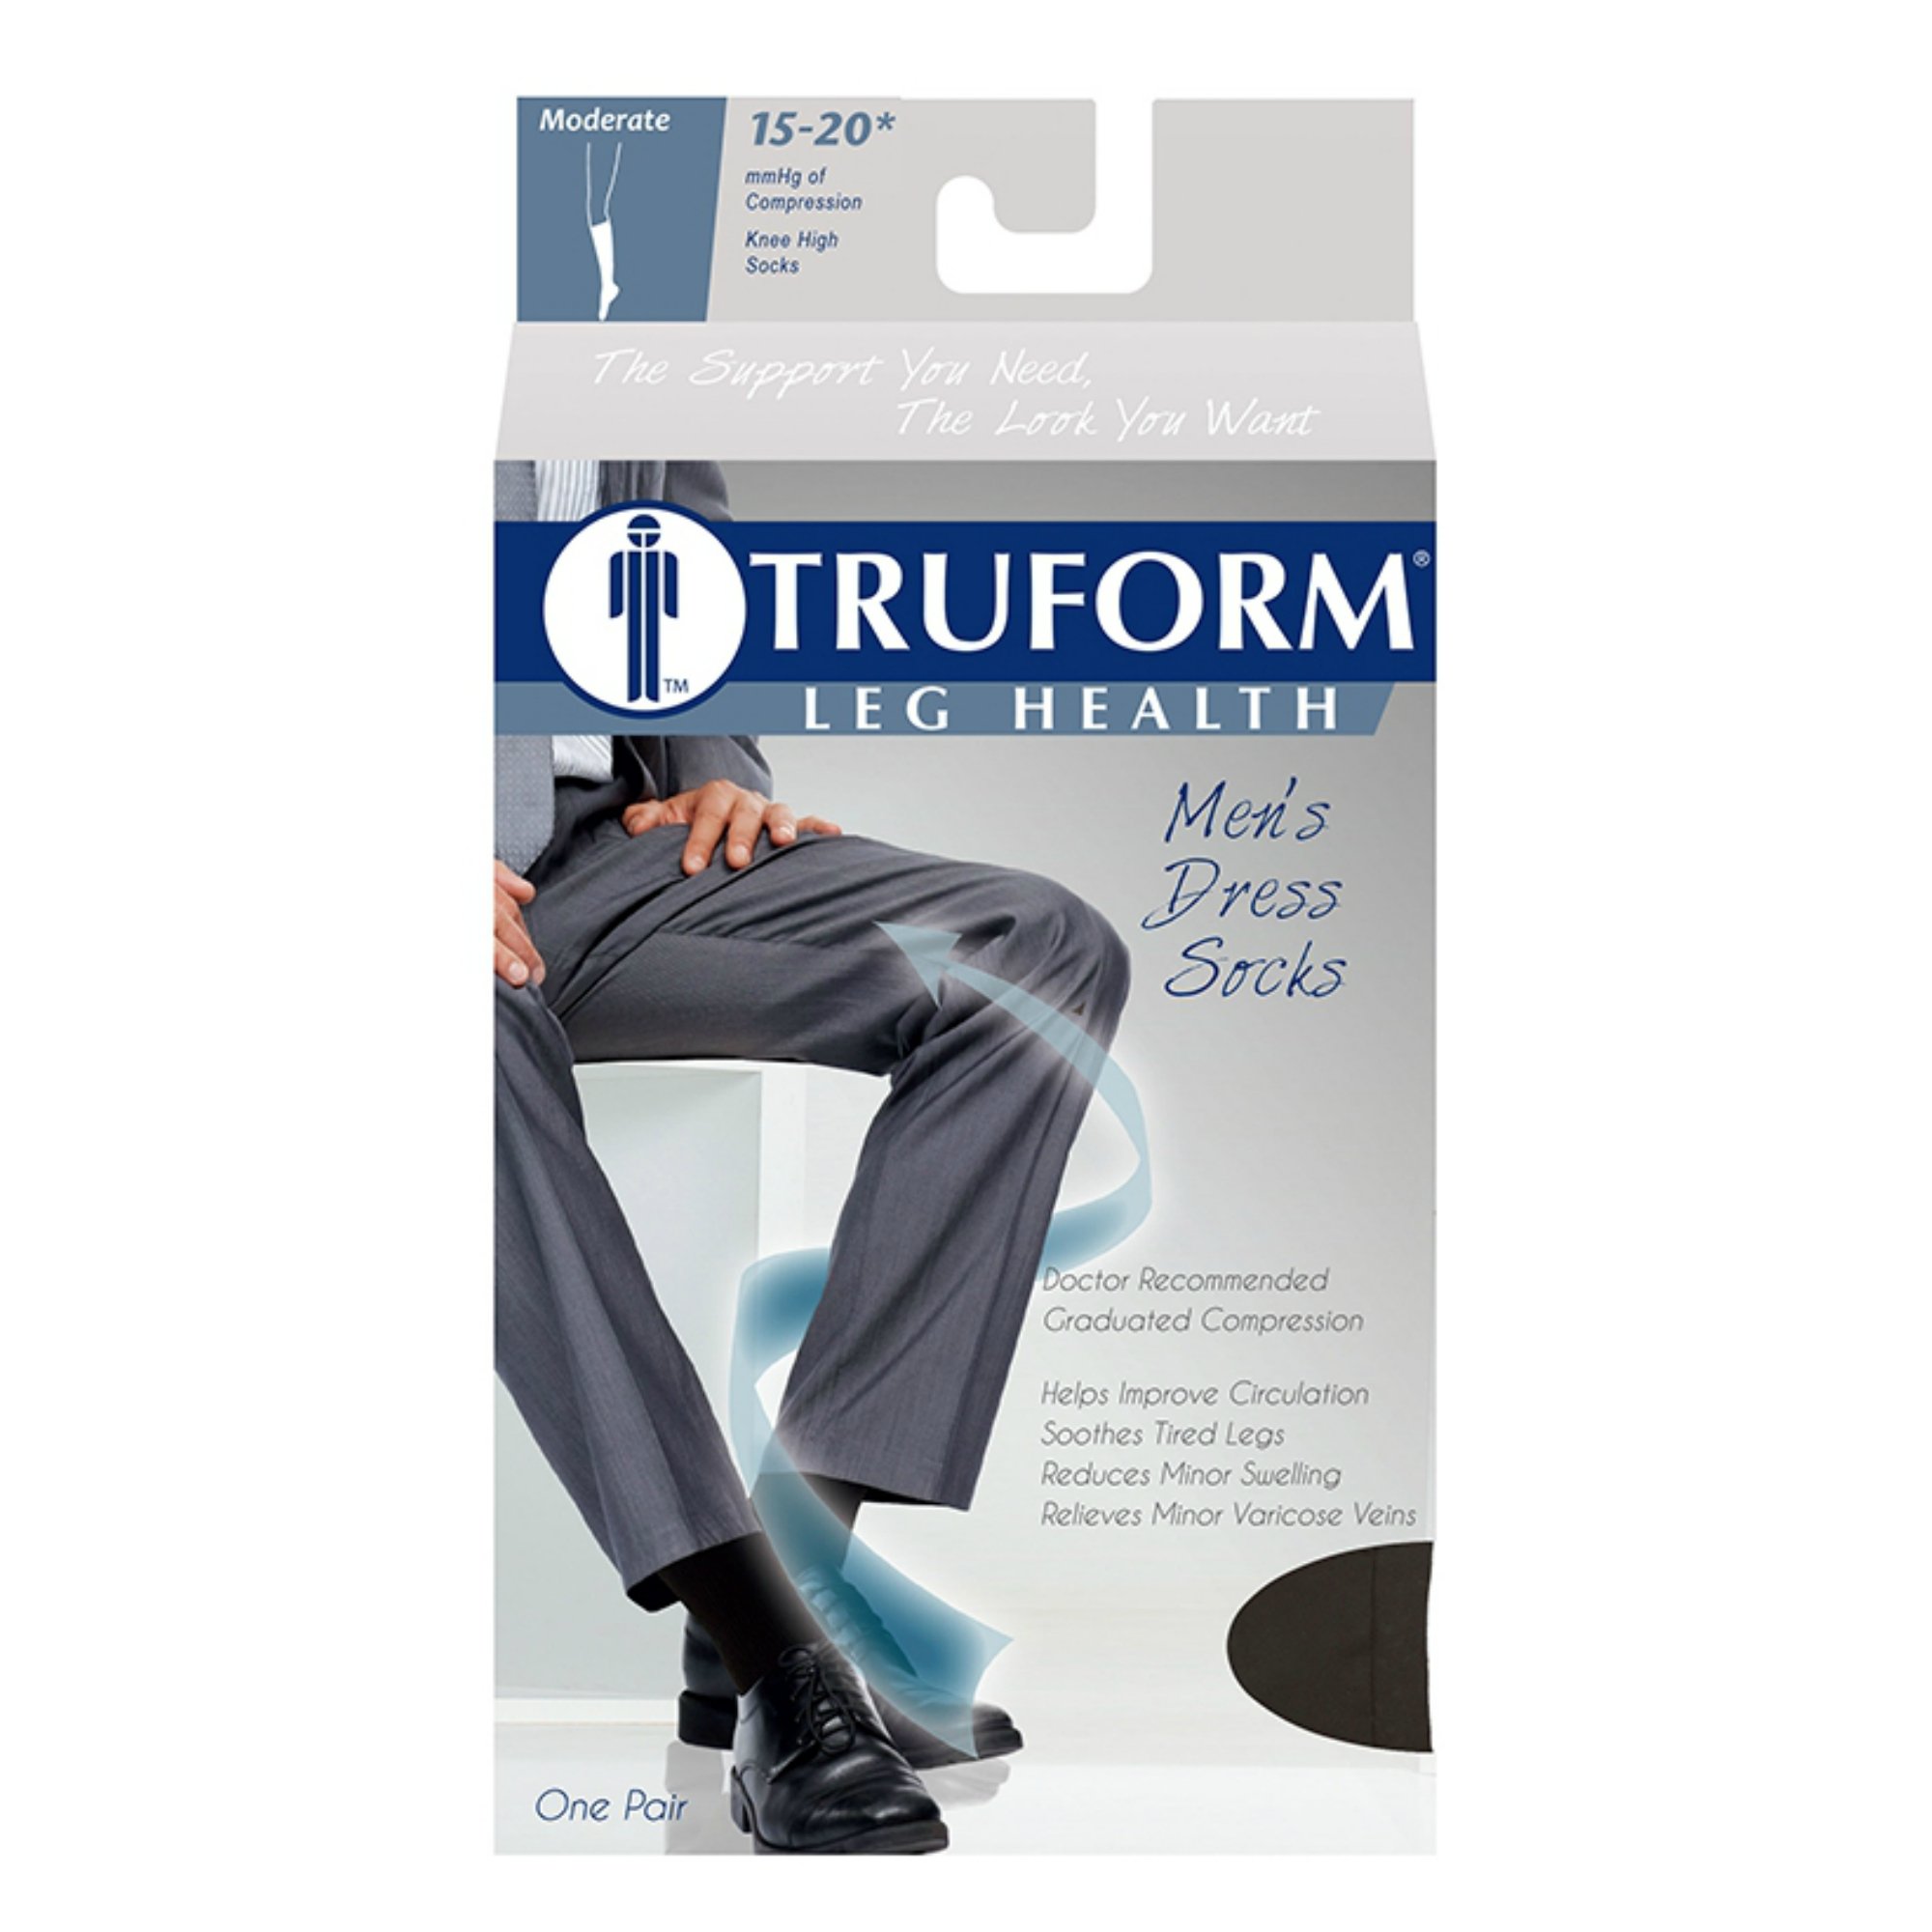 798360046 Truform Men s Compression Socks (15-20 mmHg)